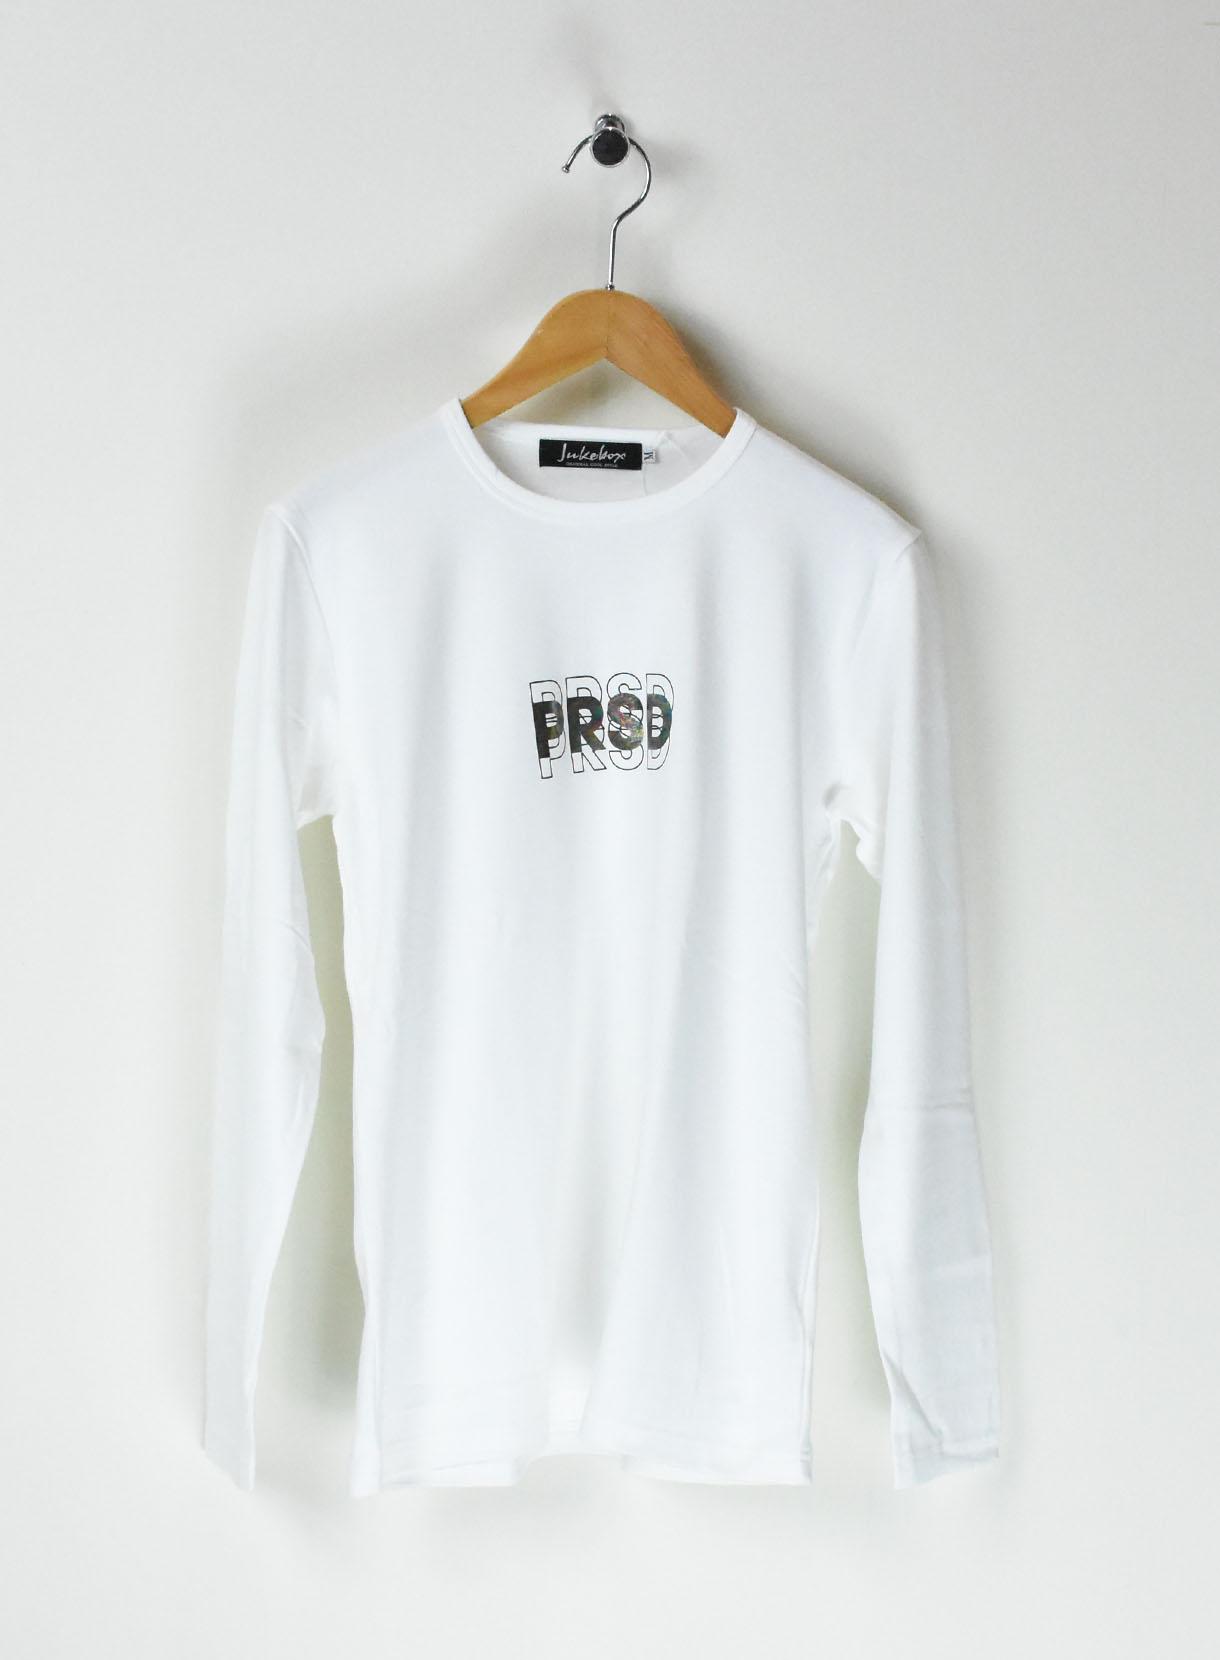 JUKEBOX 国産スムースTシャツ(PRSD)